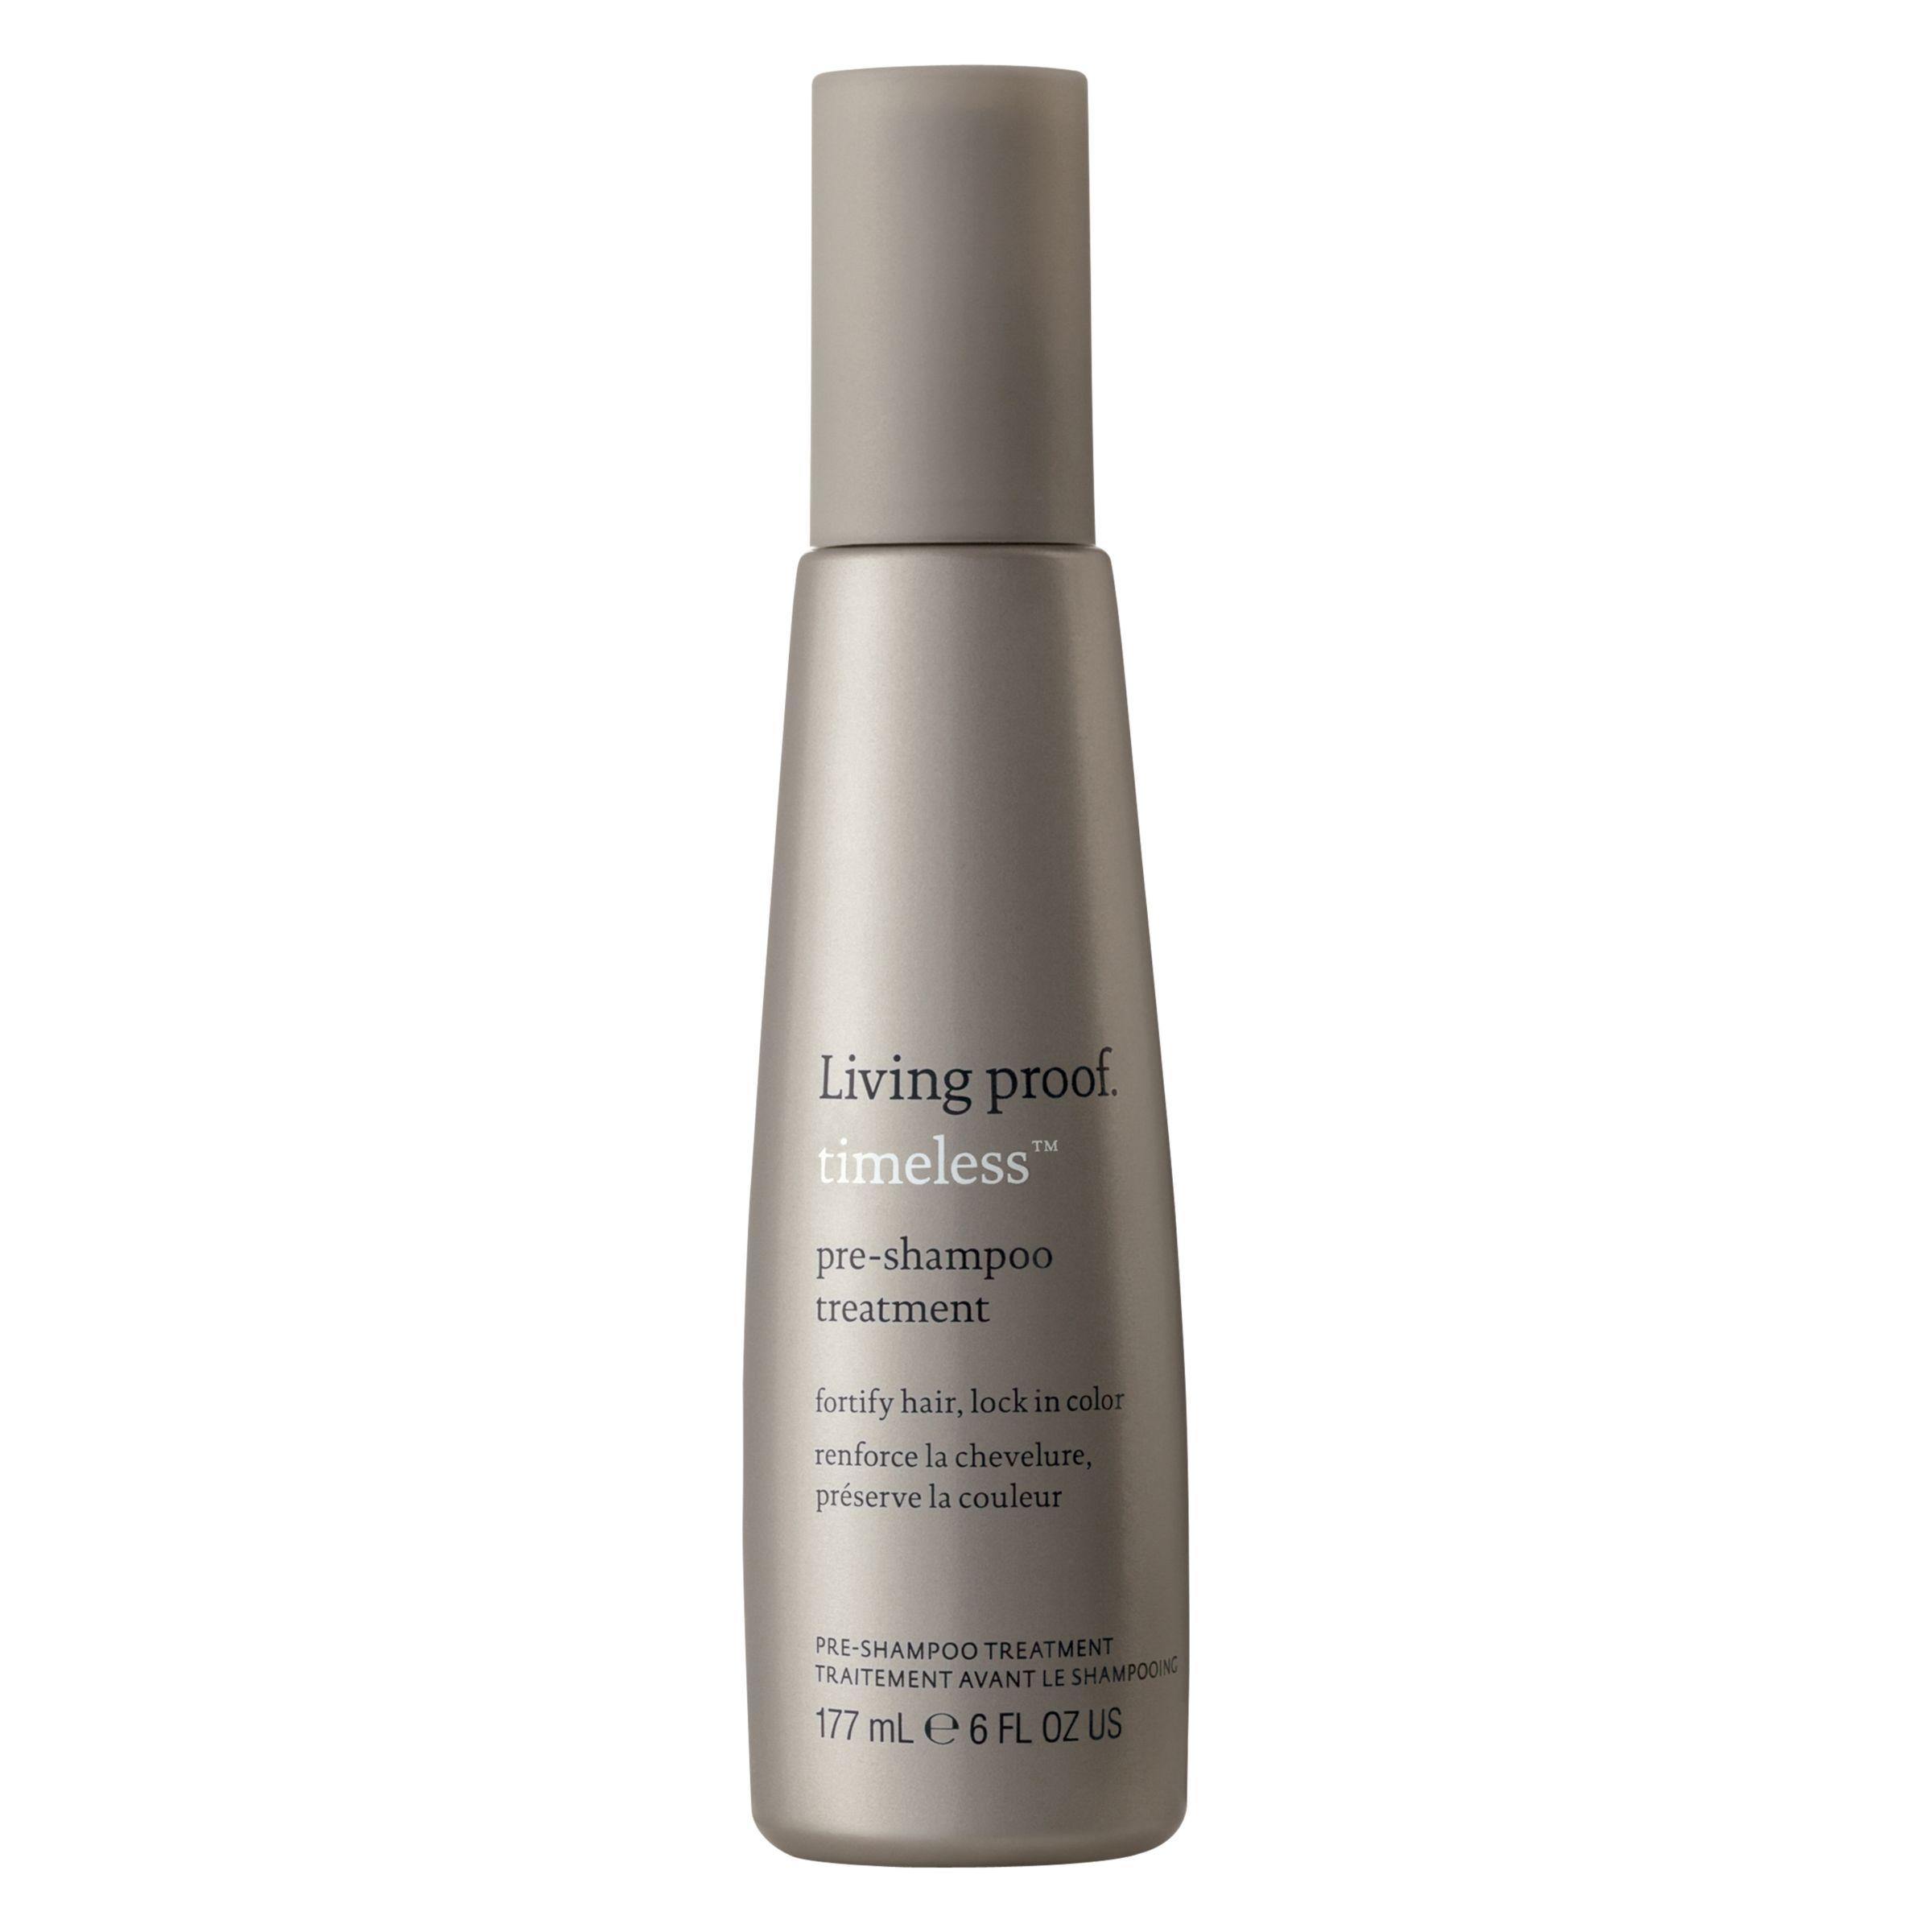 Living Proof Living Proof Timeless Pre Shampoo Treatment, 177ml